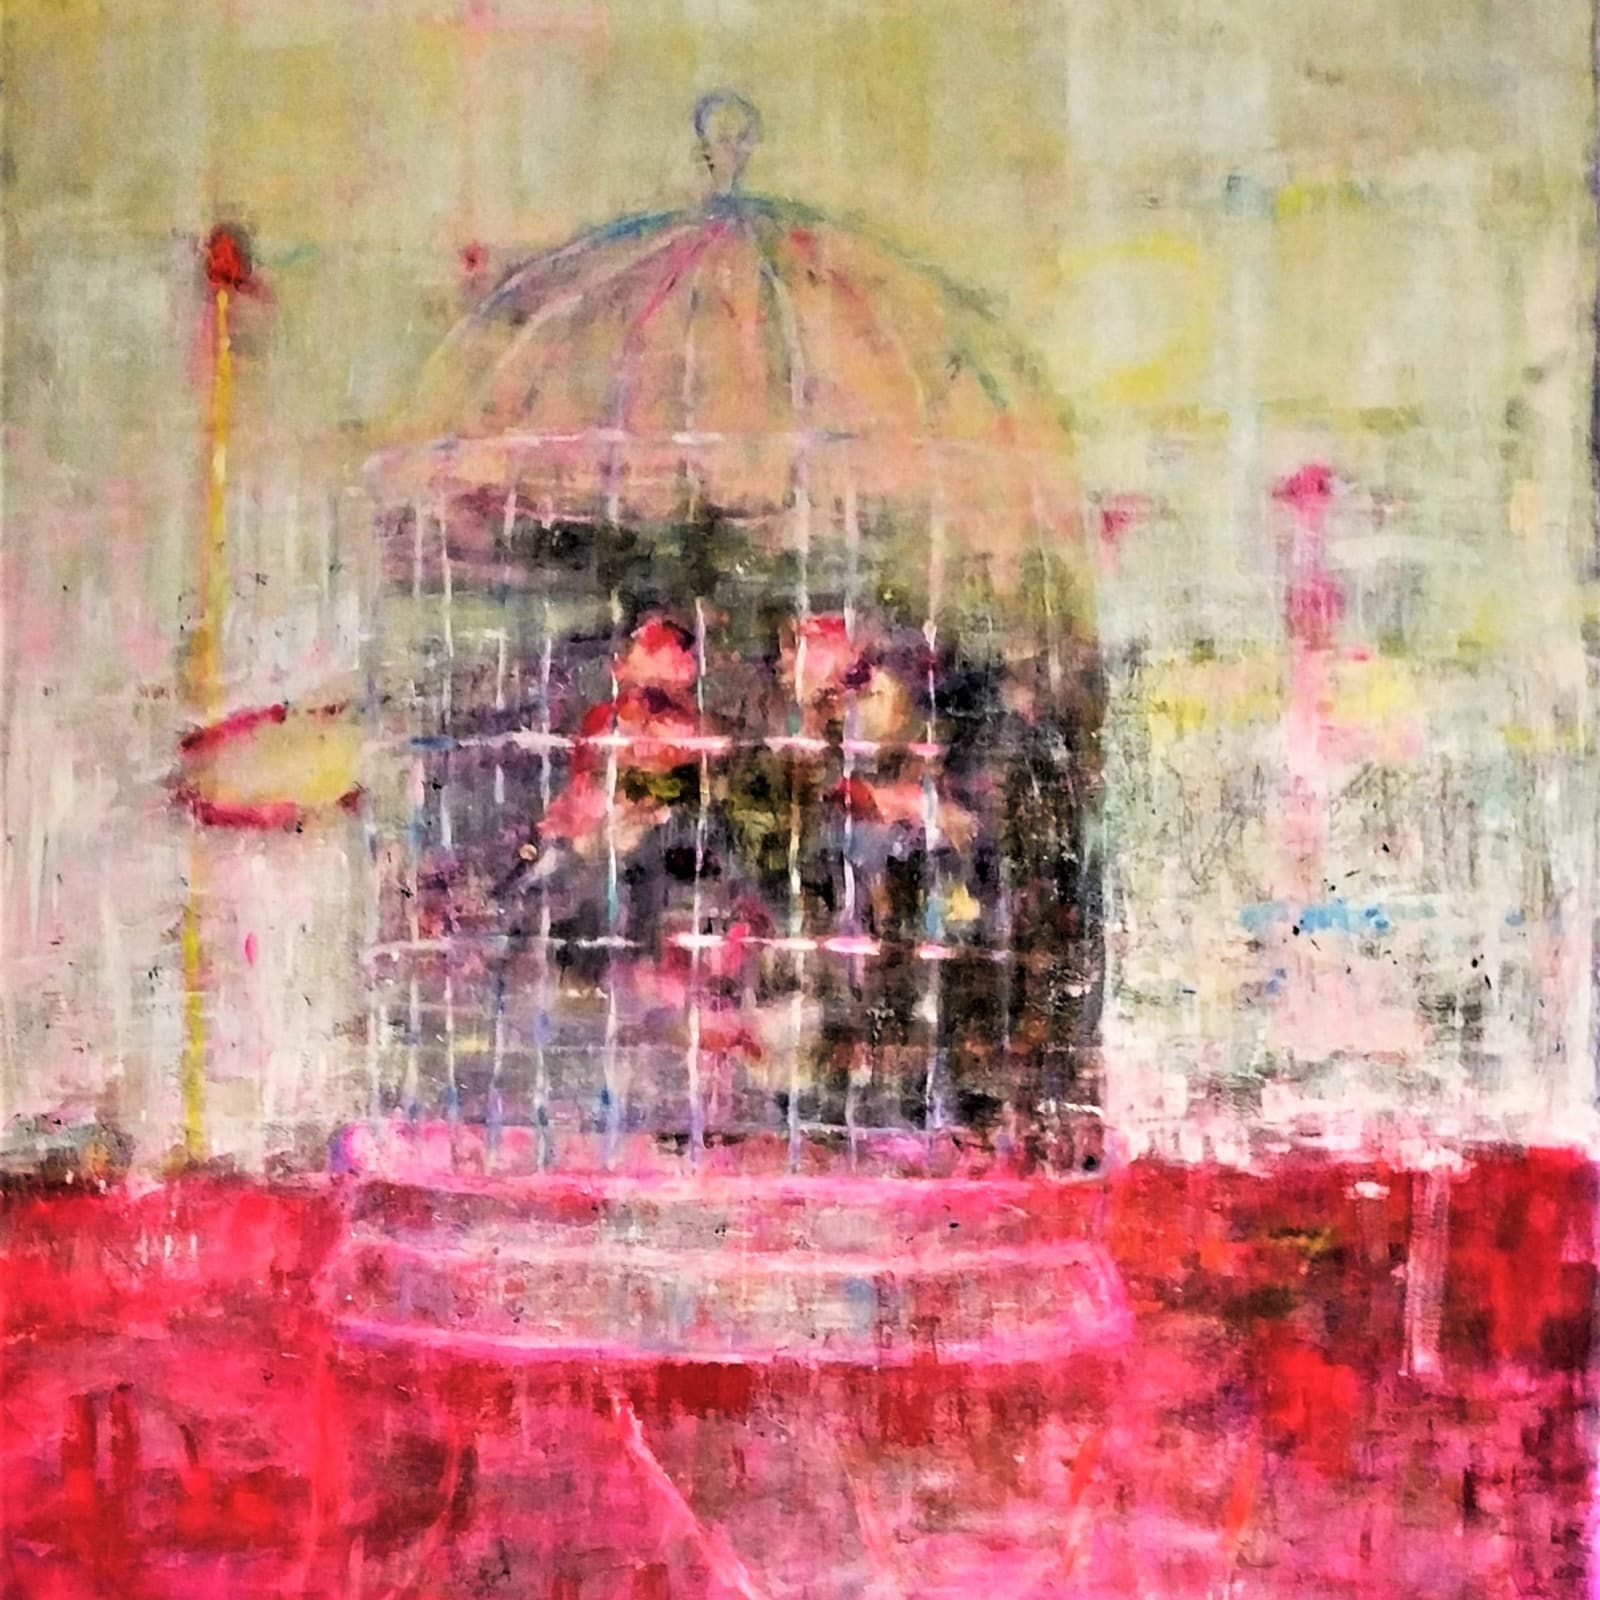 Nadia Abu Aitah, Yellow cage, 2018, Oil on canvas, 162x130cm